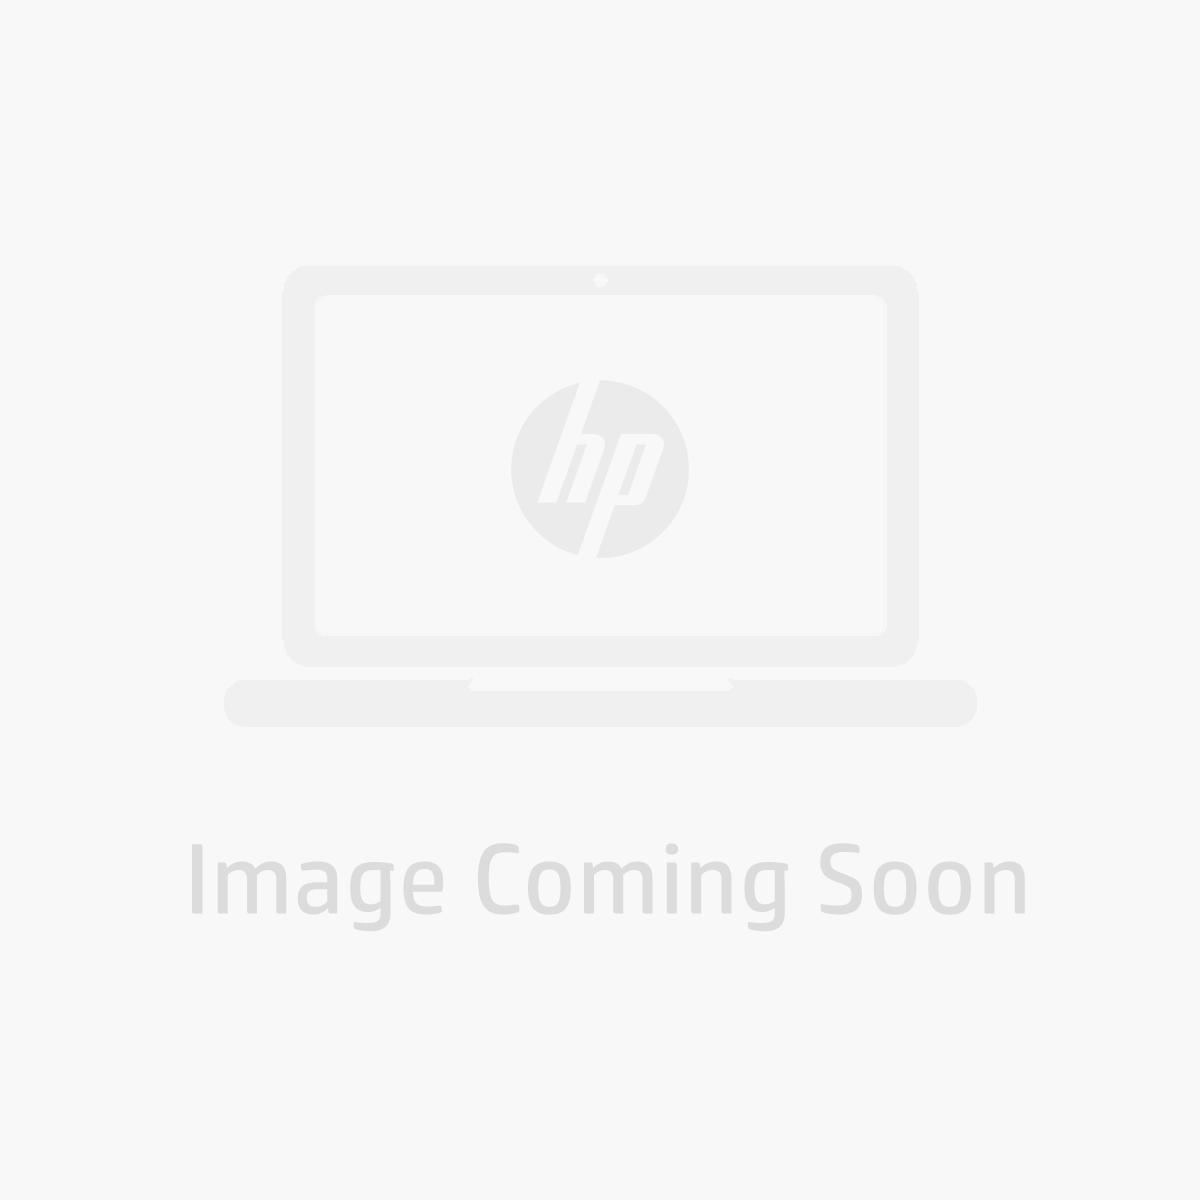 Image of HP HP 49A Black Original LaserJet Toner Cartridge